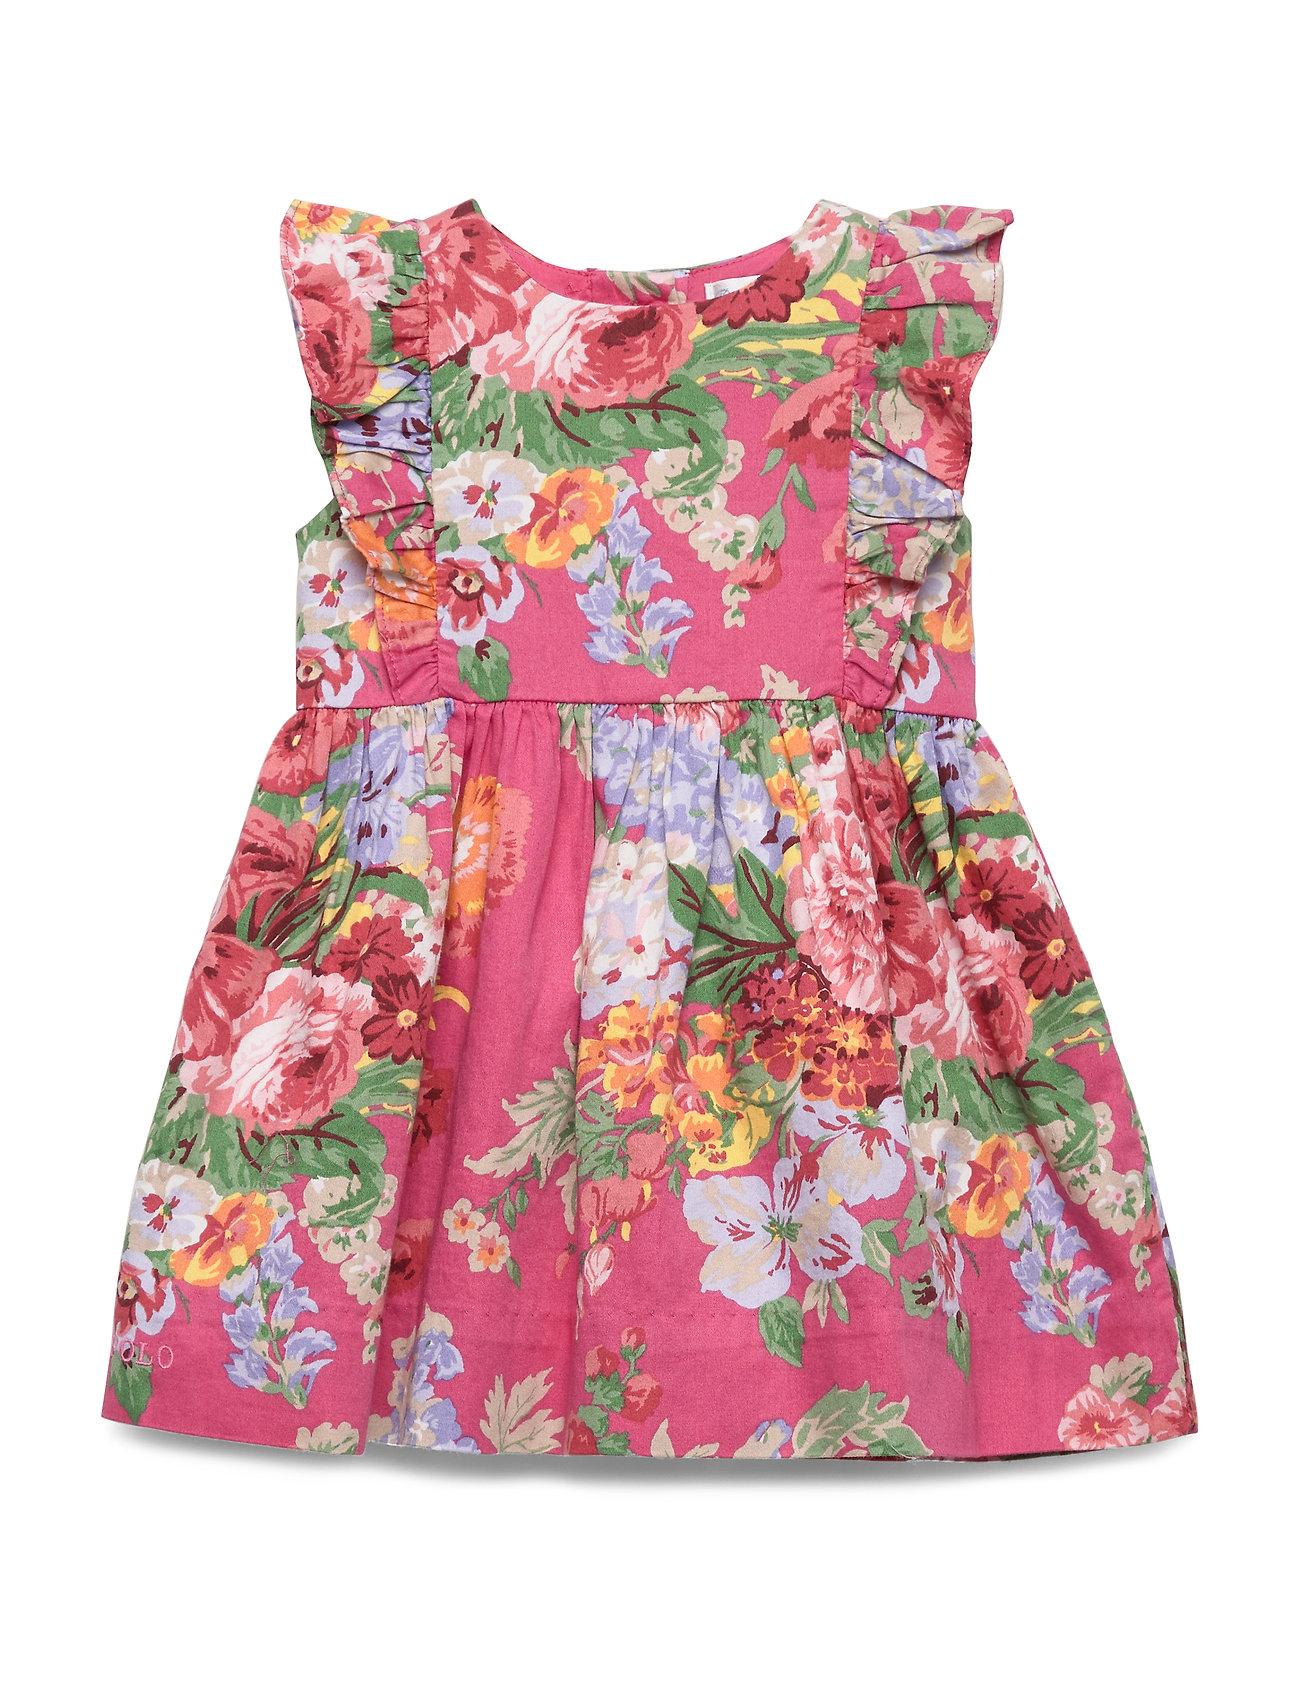 Ralph Lauren Baby Ruffled Floral Dress & Bloomer - PINK MULTI